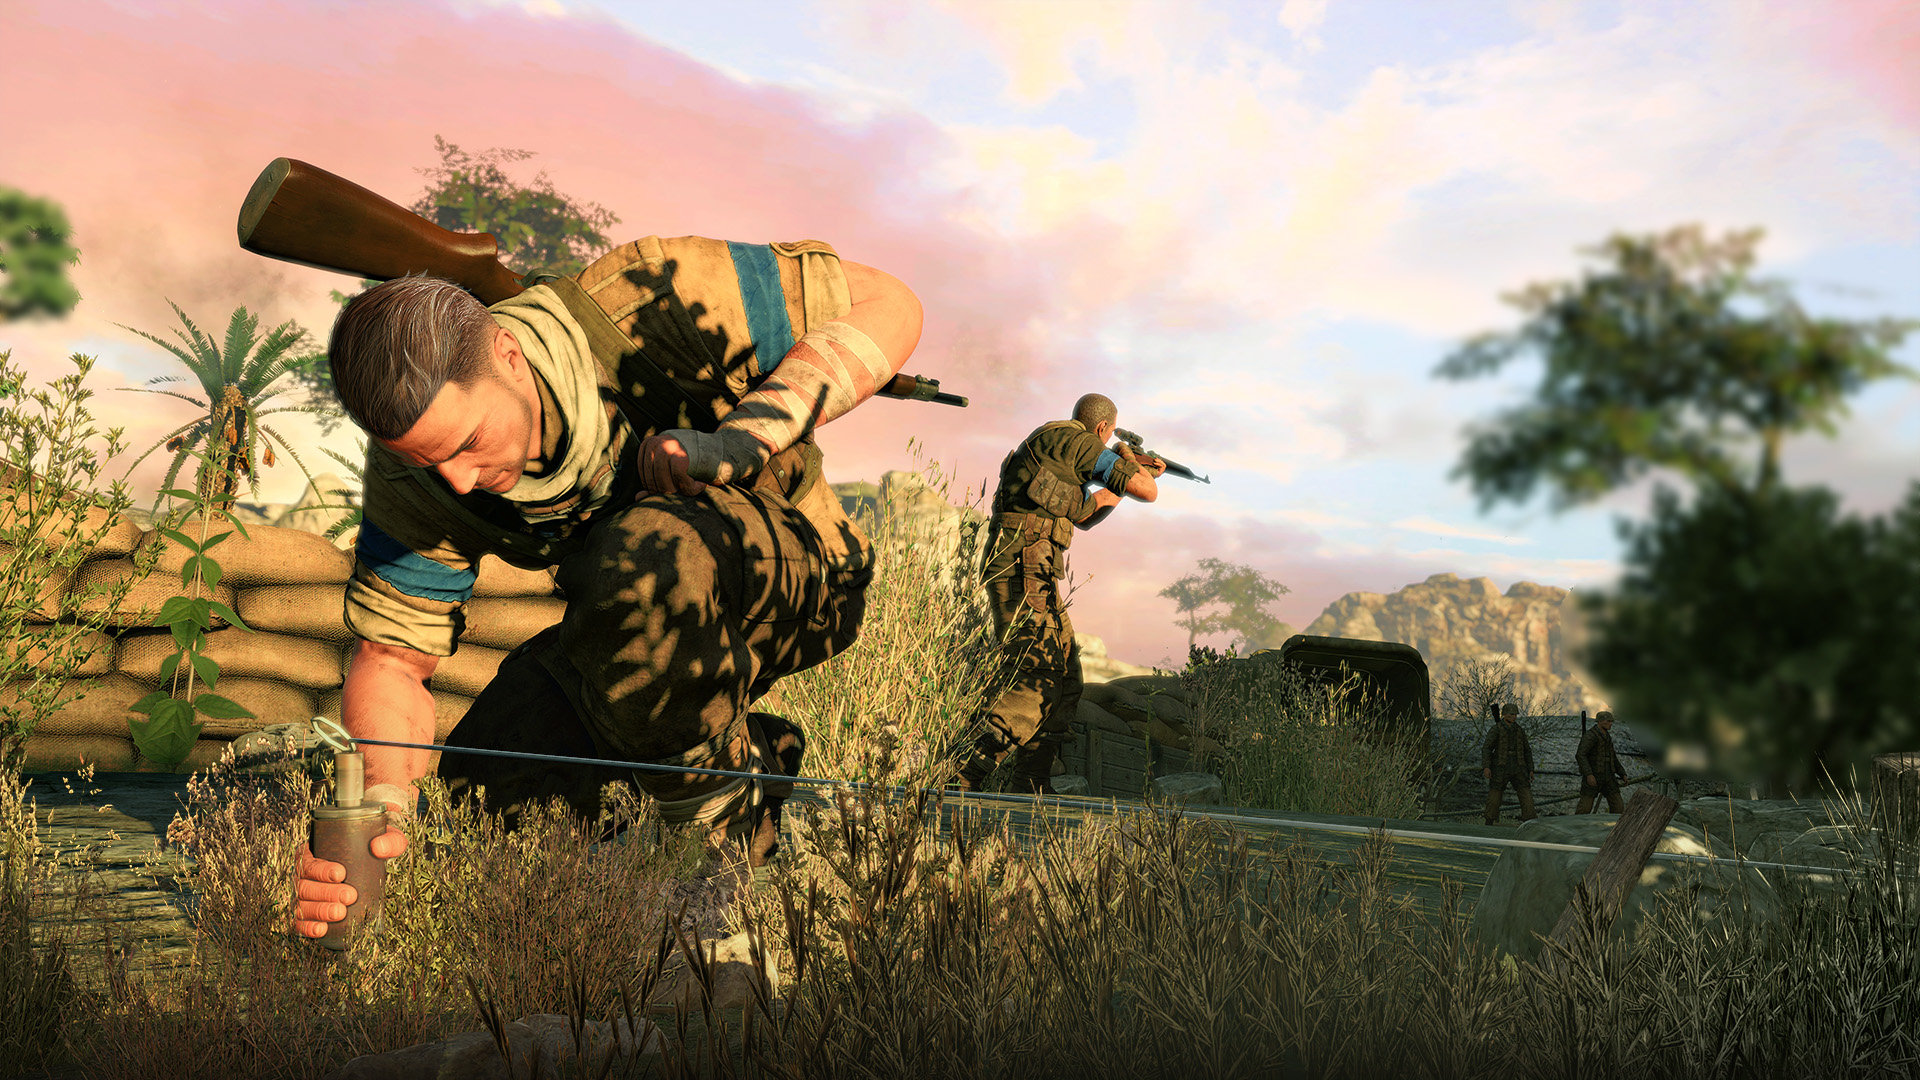 sniper-elite-3-screenshot-14-ps4-us-12ju